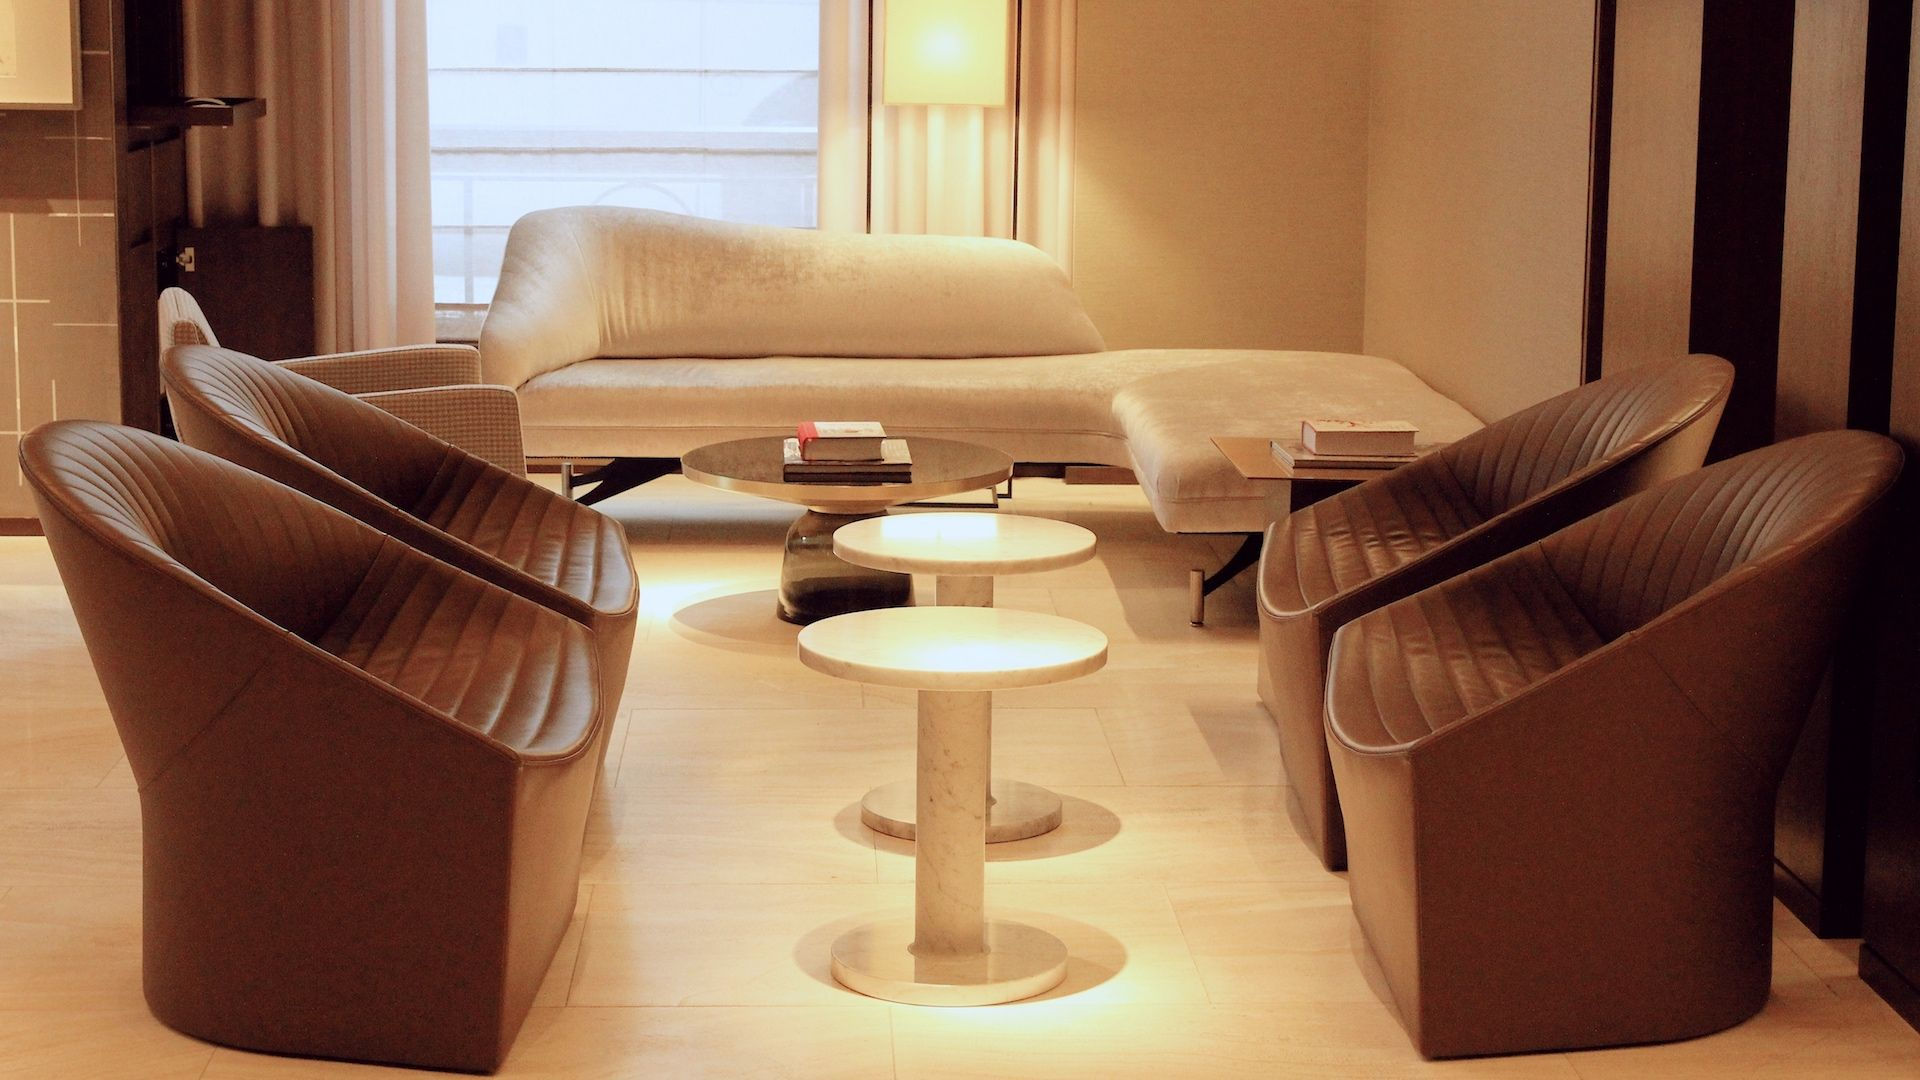 REVIEW Four Seasons Downtown Hotel: pura elegancia en Nueva York